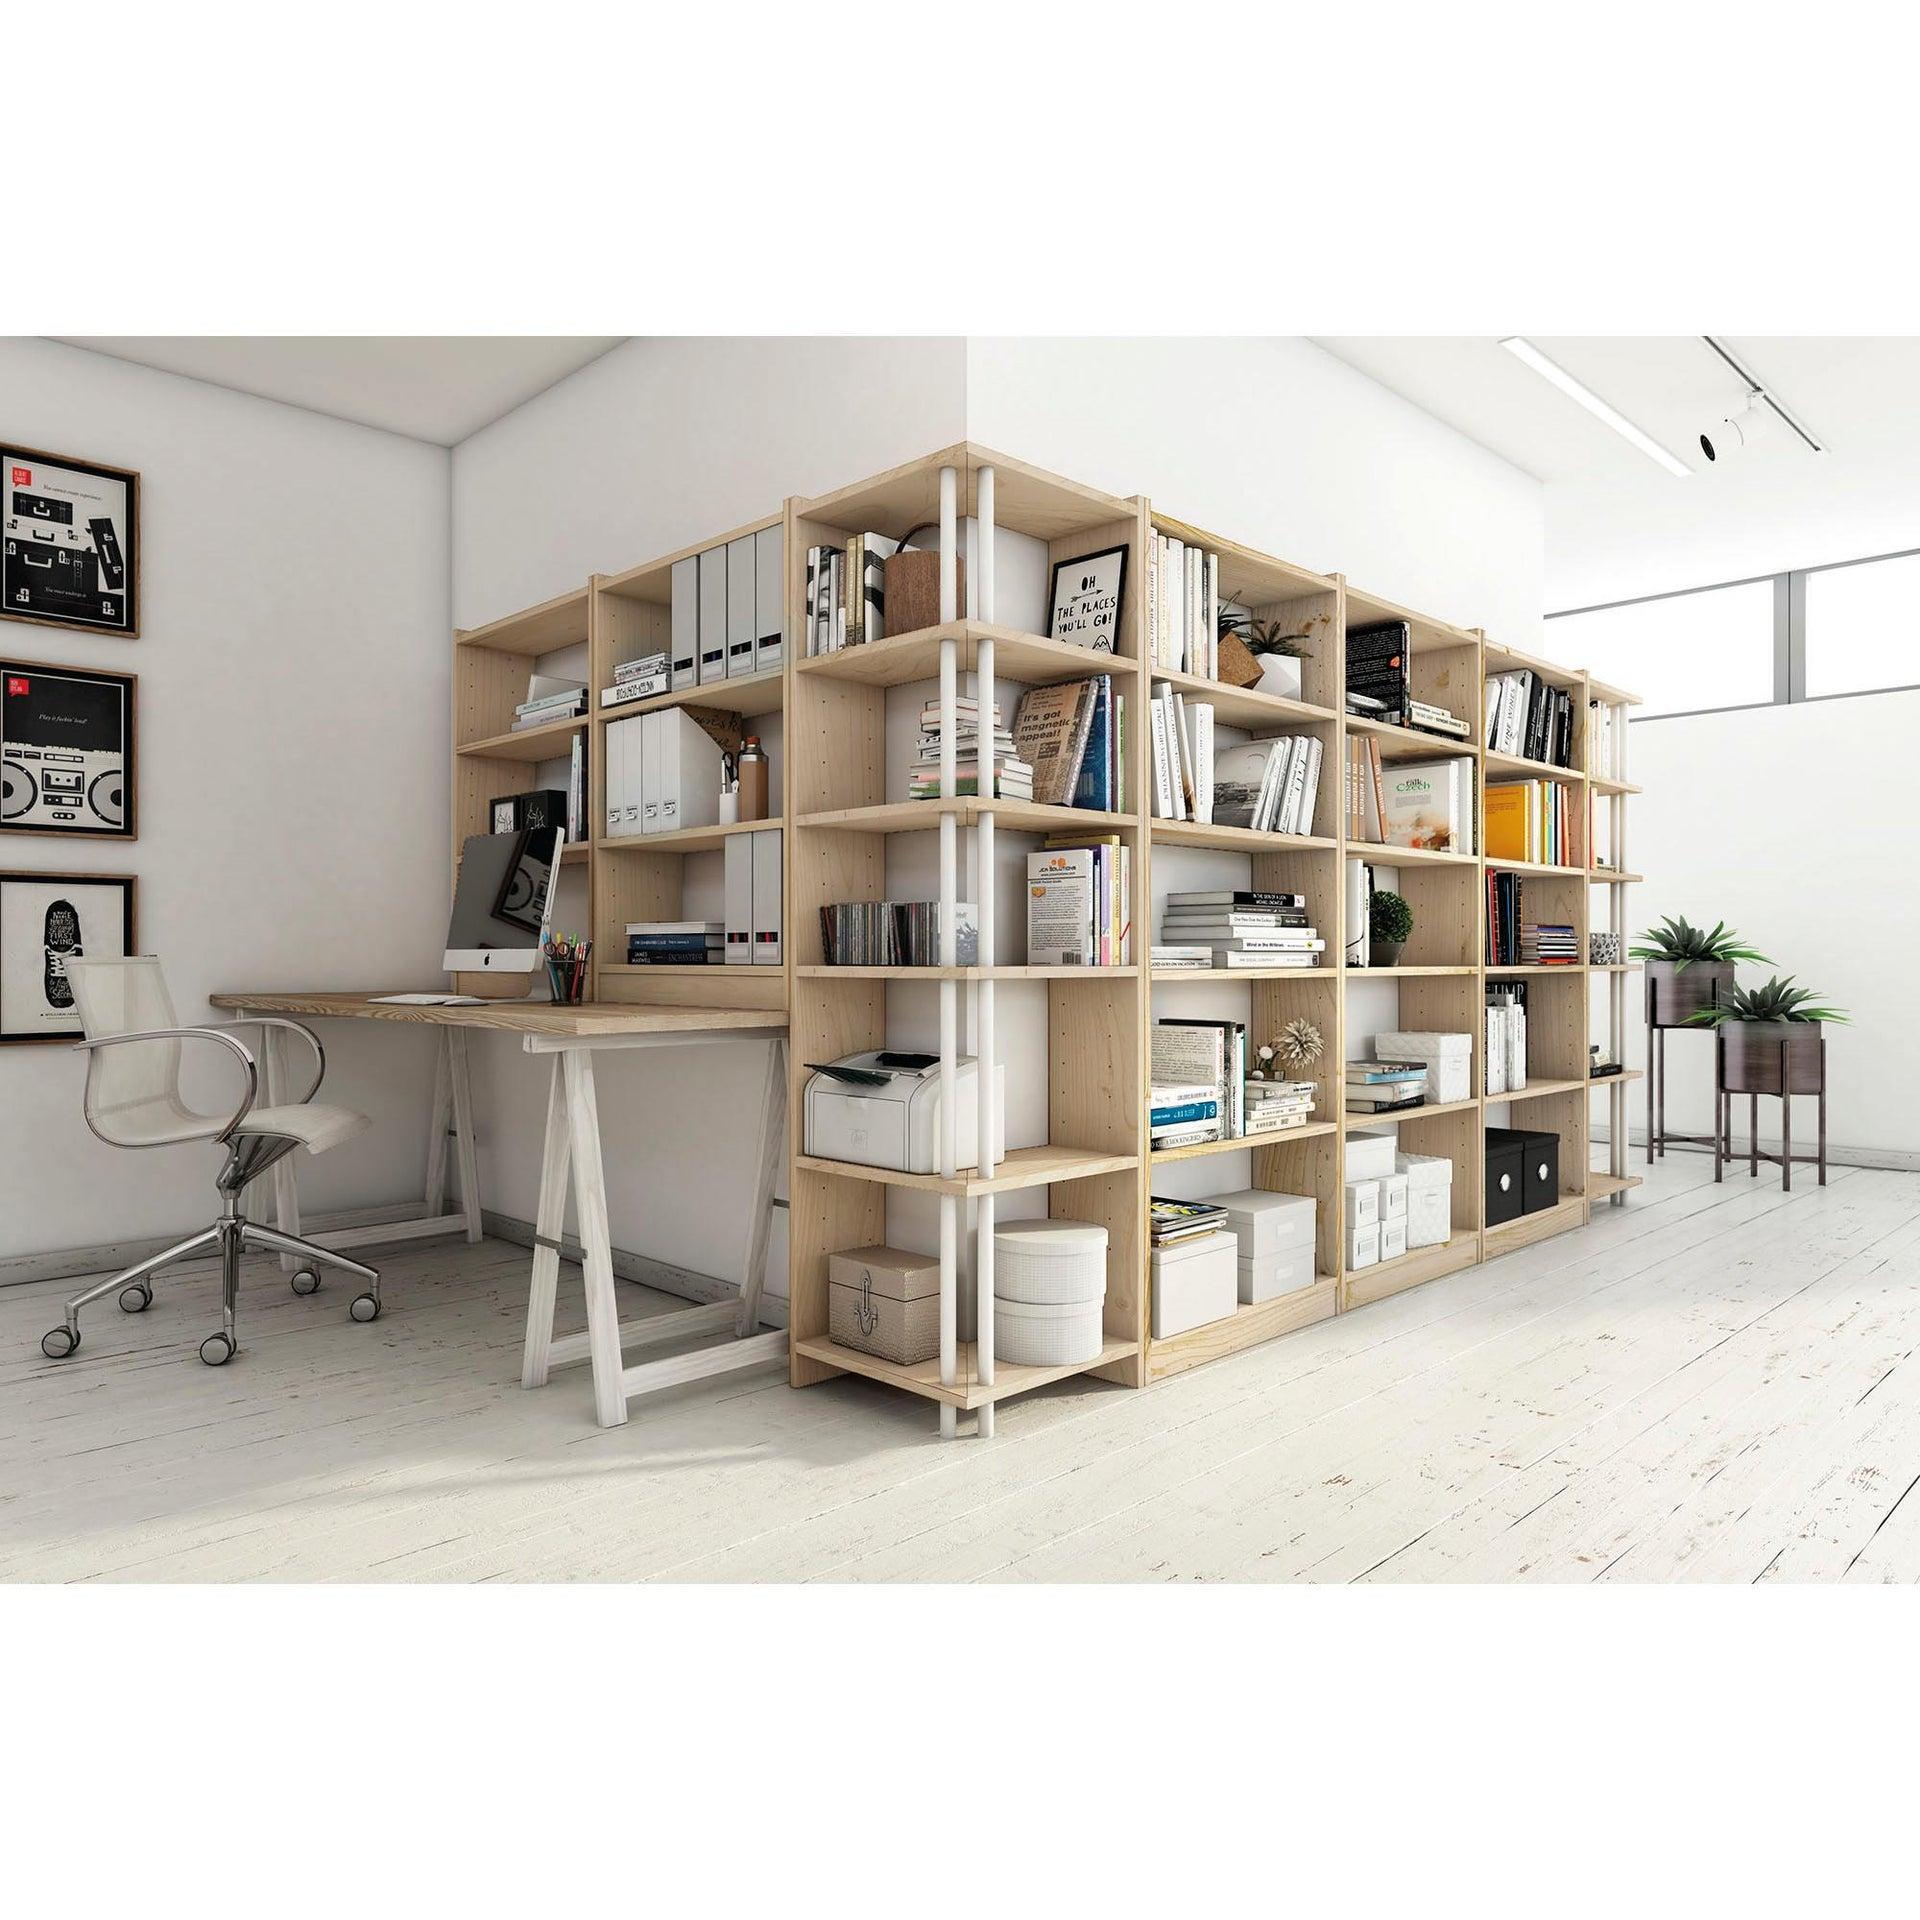 Libreria Gala L 80 x P 25 x H 184.7 cm - 22